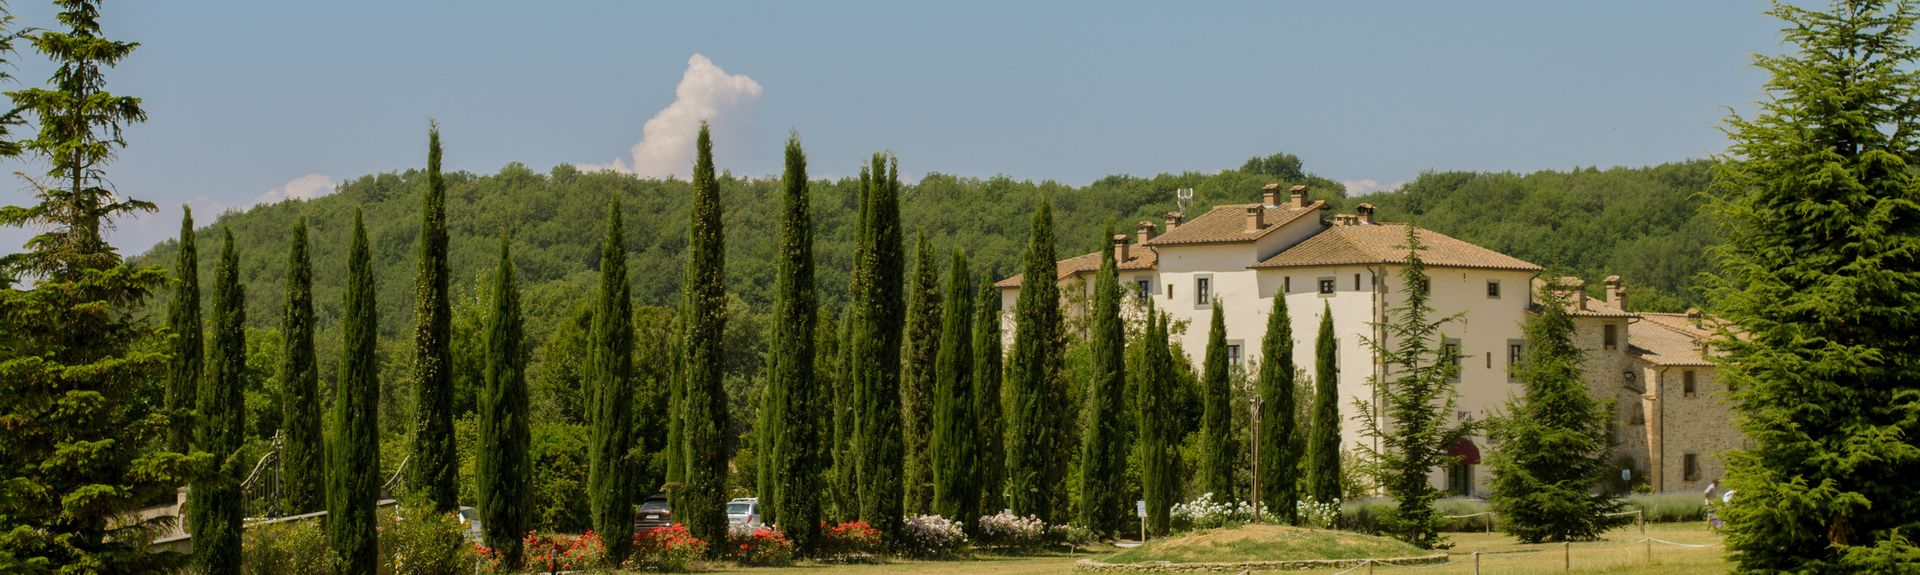 Kommunalt kunstgalleri, Castiglion Fiorentino, Toscana, Italia